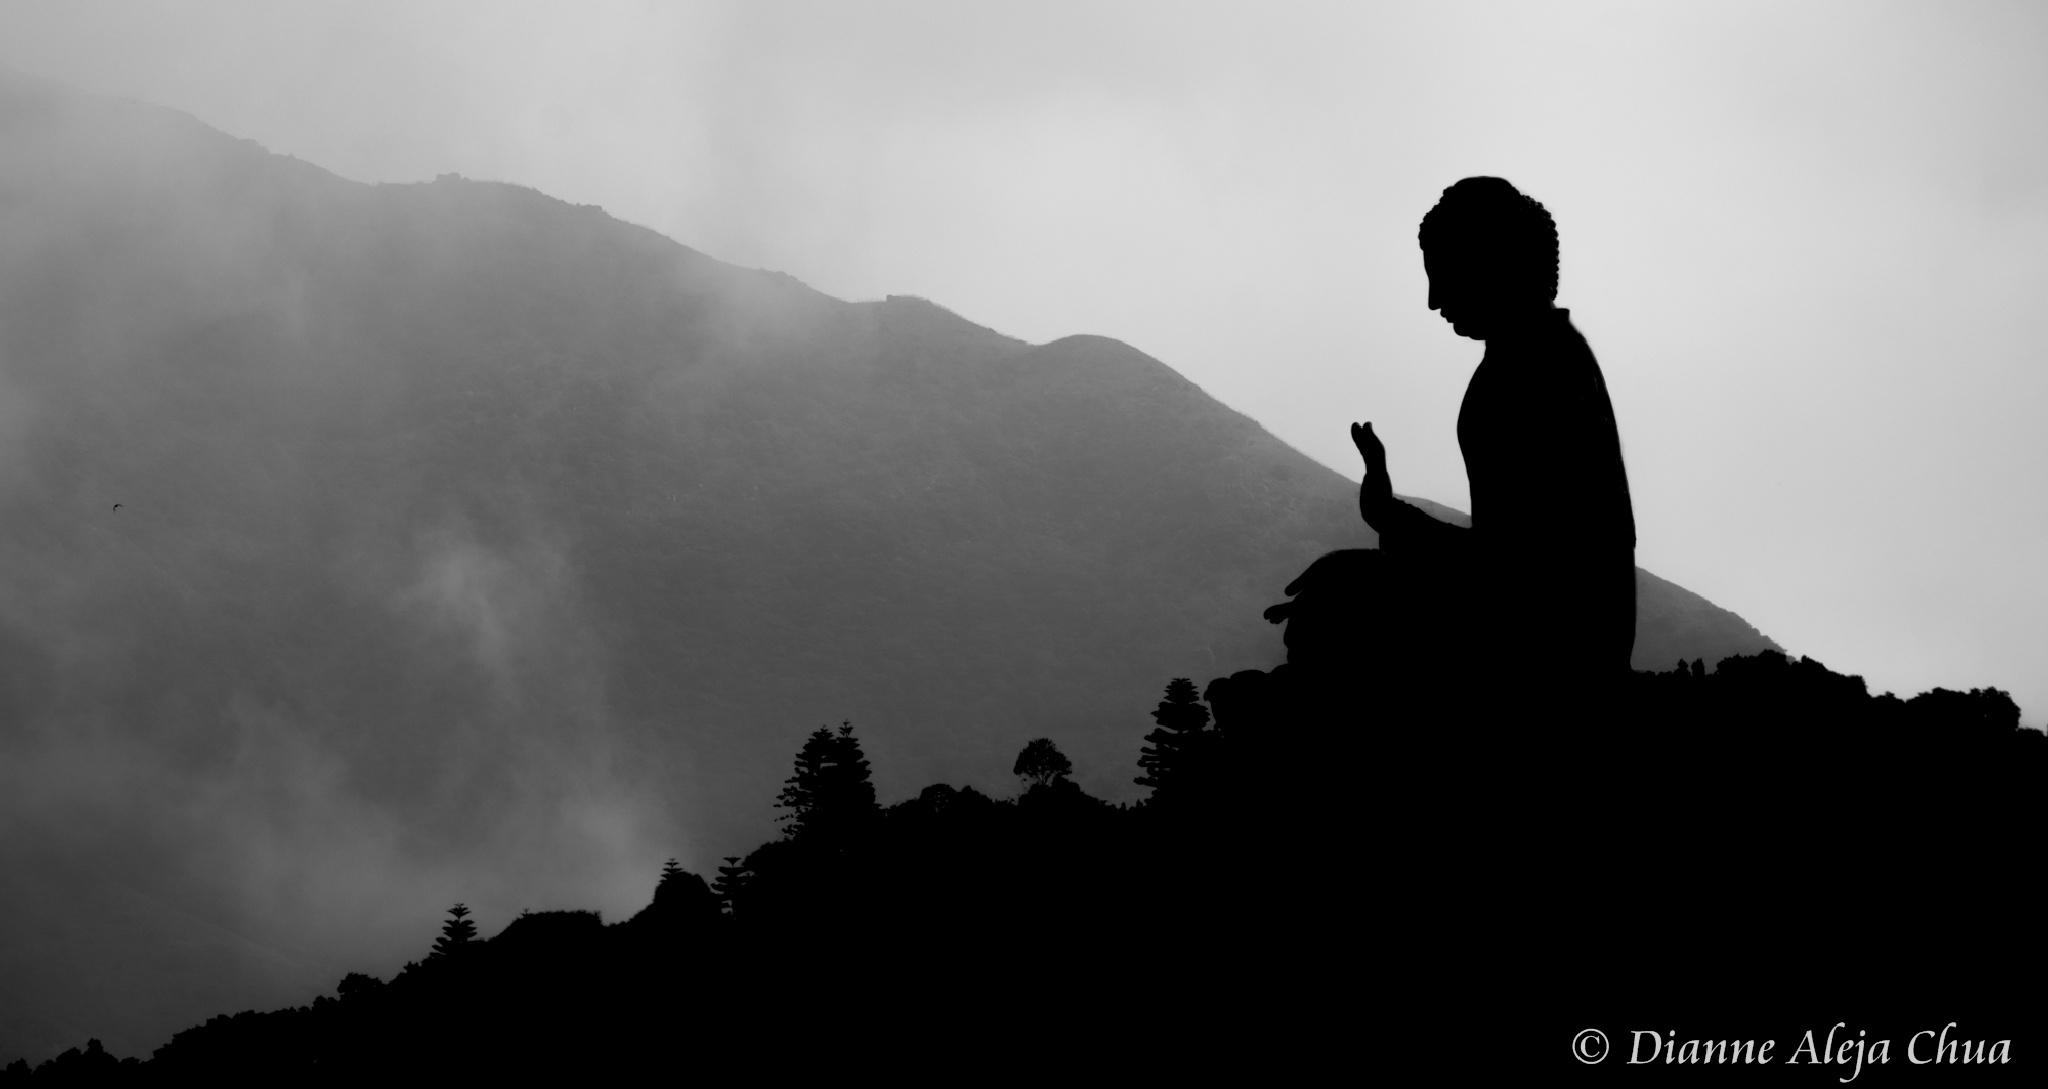 Tian Tan Buddha by Dianne Aleja Chua